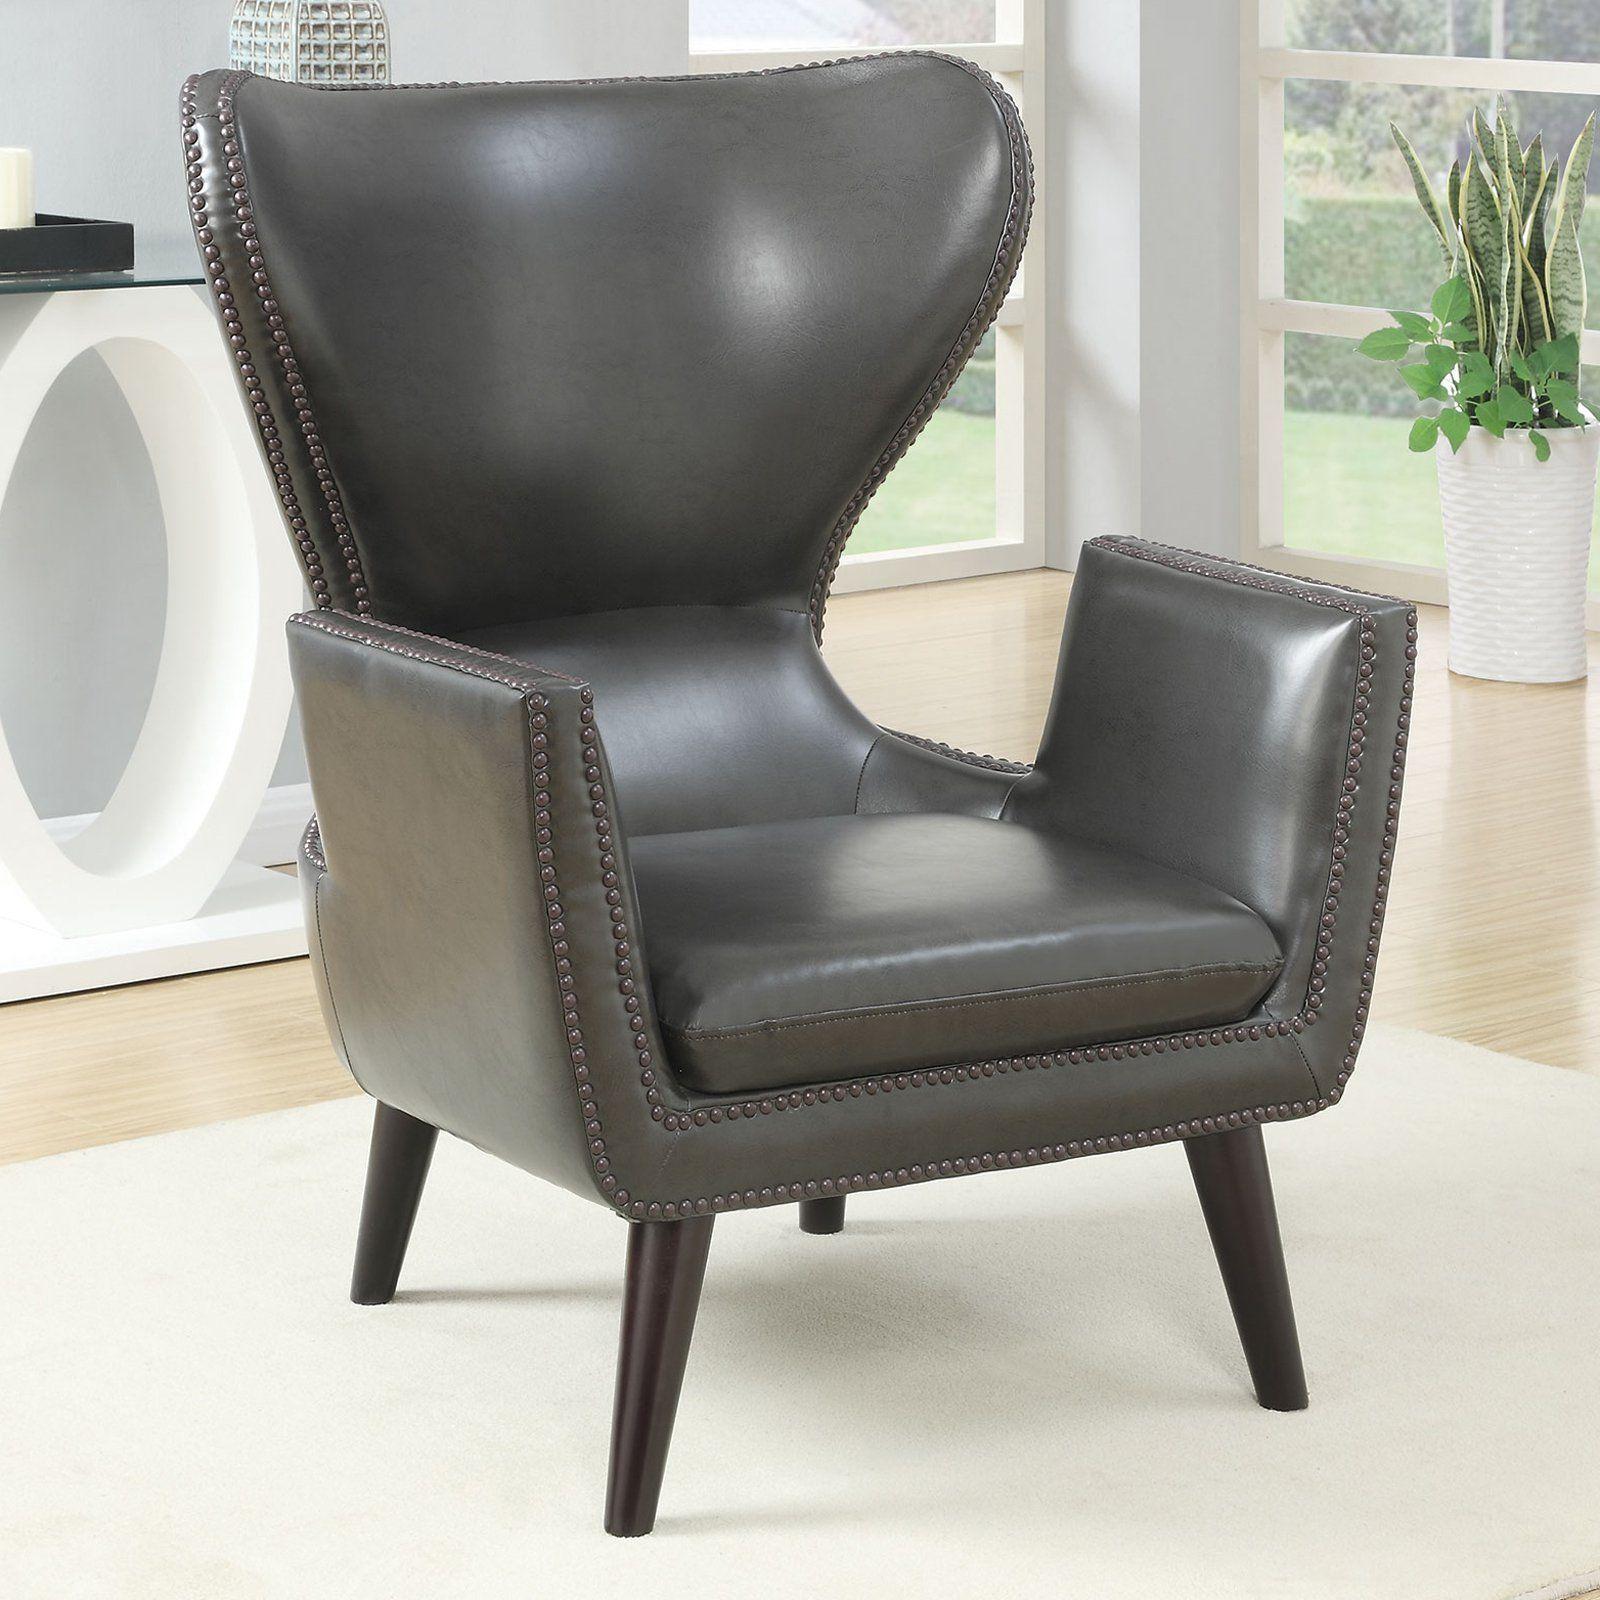 Coaster Furniture El Segundo Wingback Chair 902409